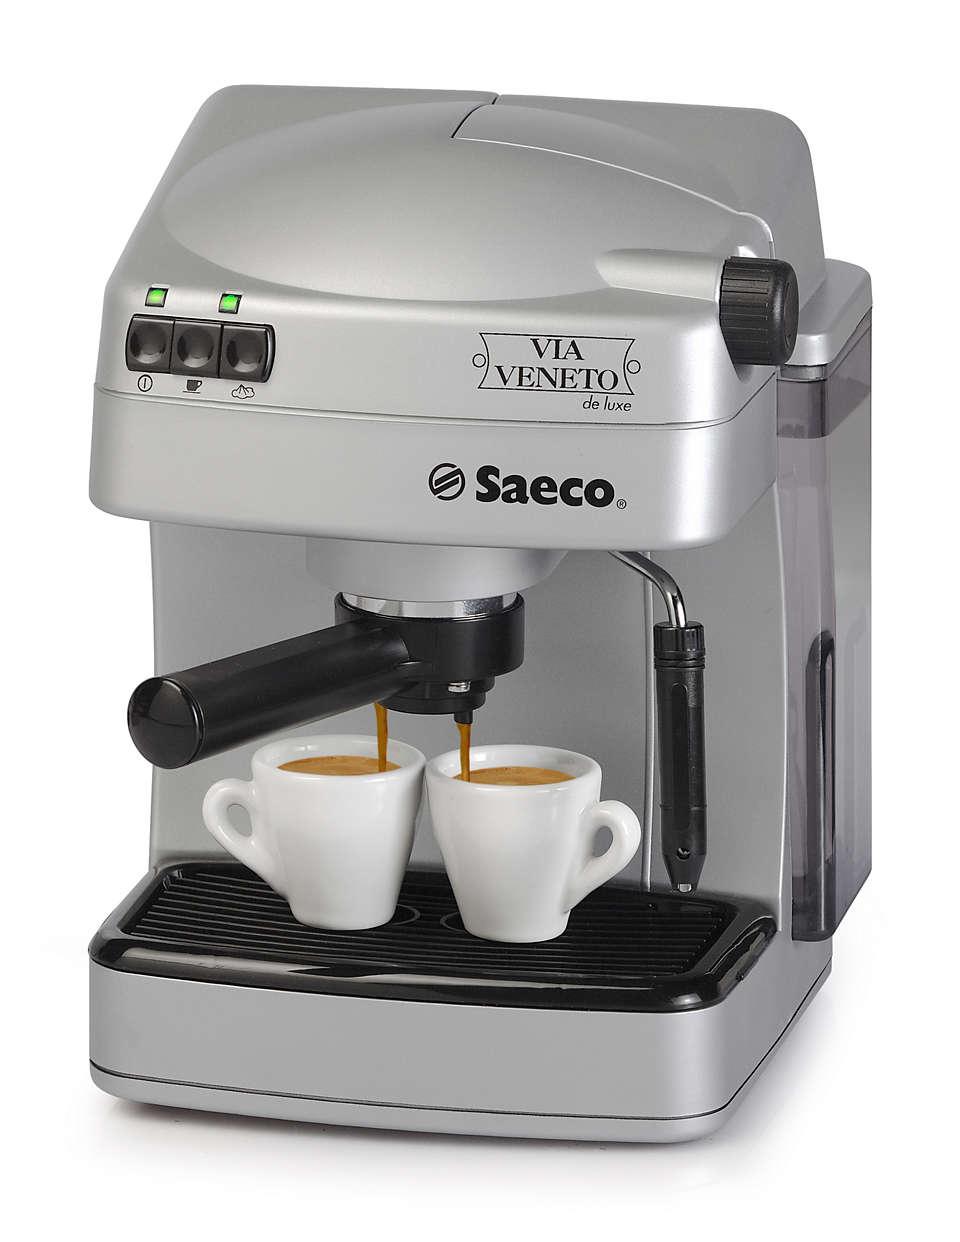 Enjoy your Italian Espresso